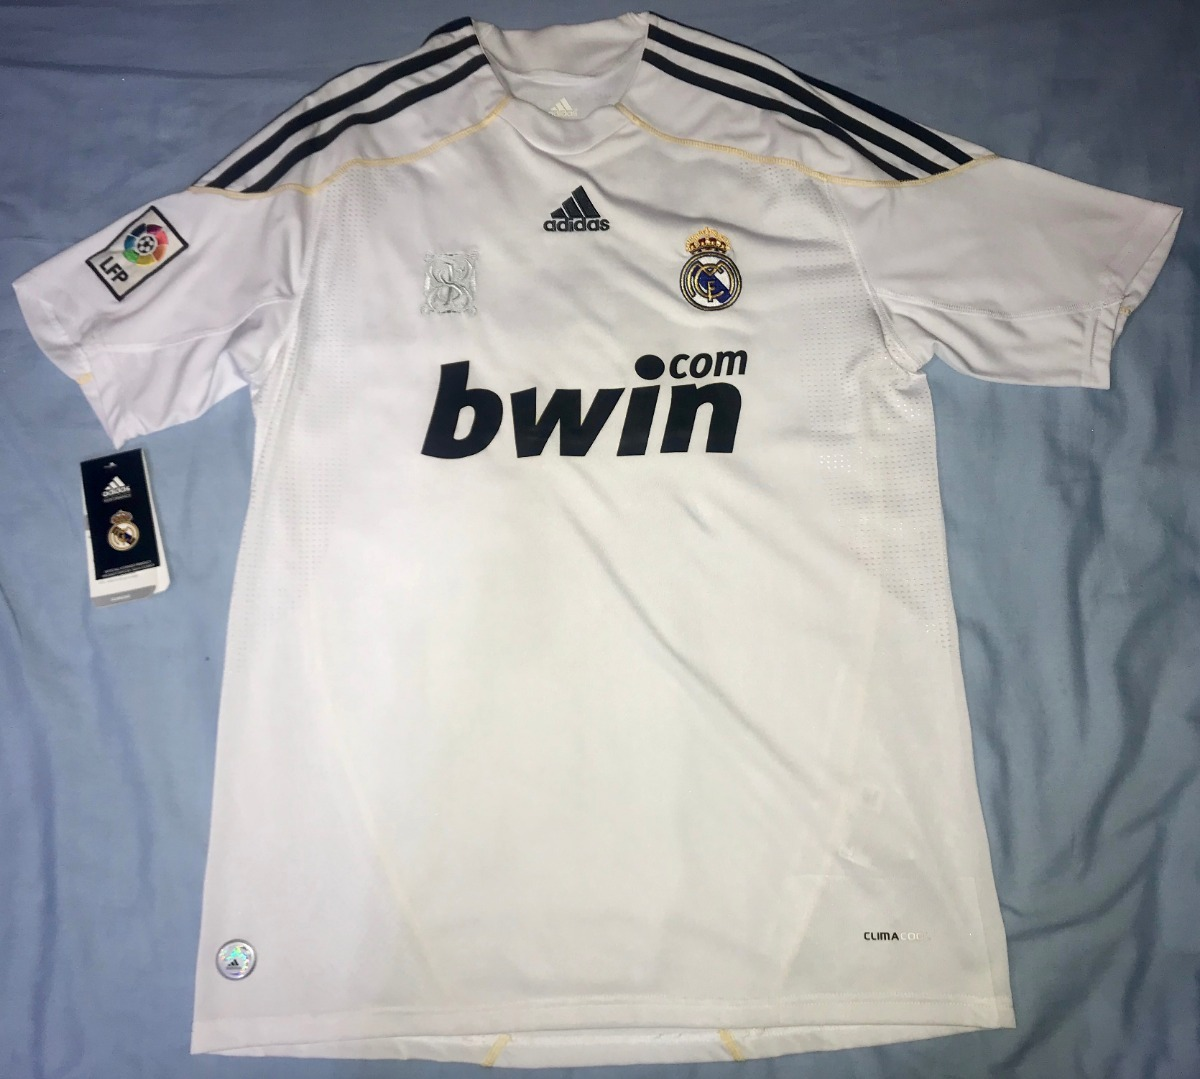 6df279d26 camiseta real madrid 2009 cristiano ronaldo 9. Cargando zoom.